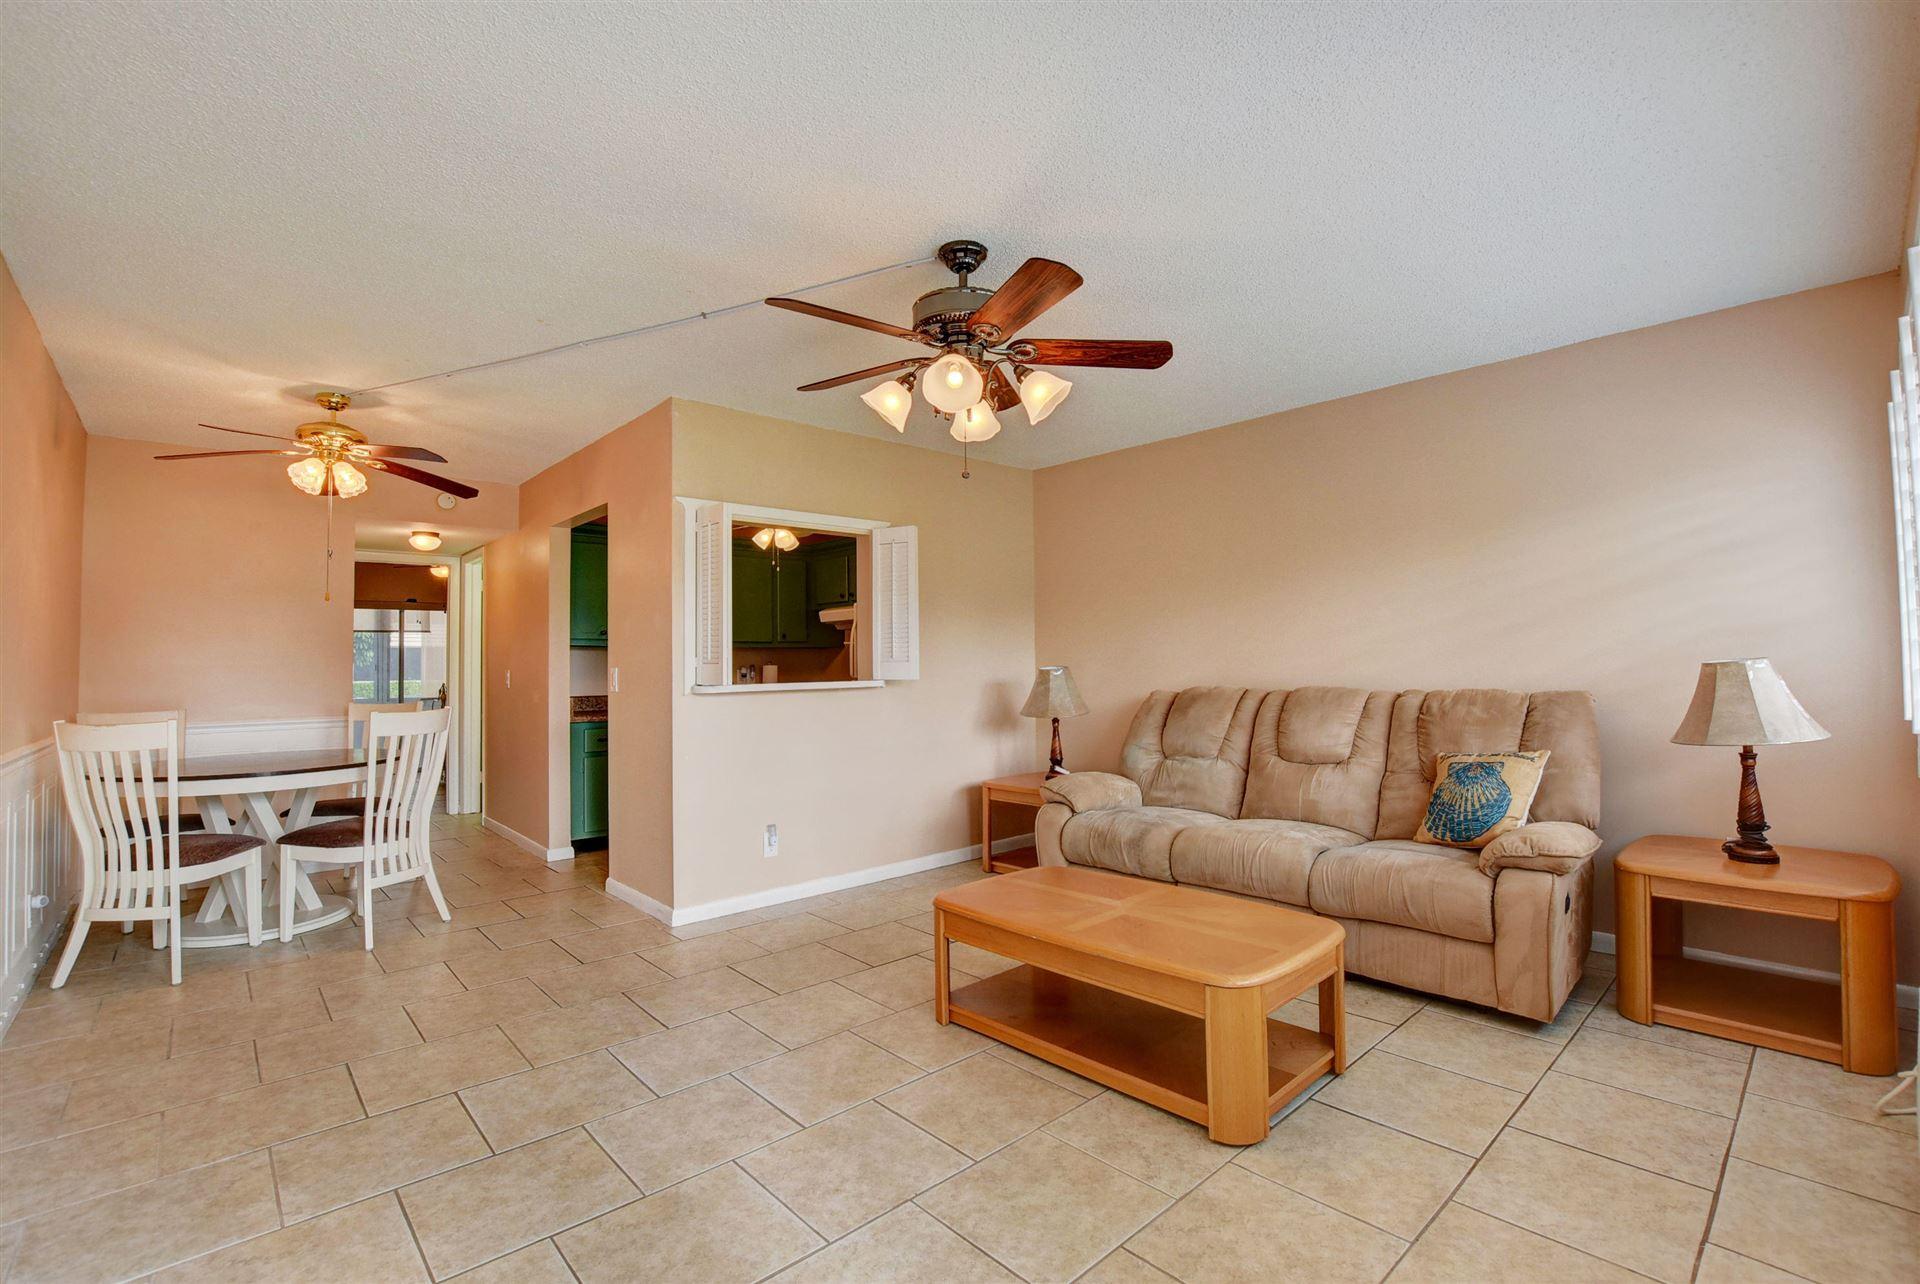 102 Cambridge E, West Palm Beach, FL 33417 - MLS#: RX-10714494